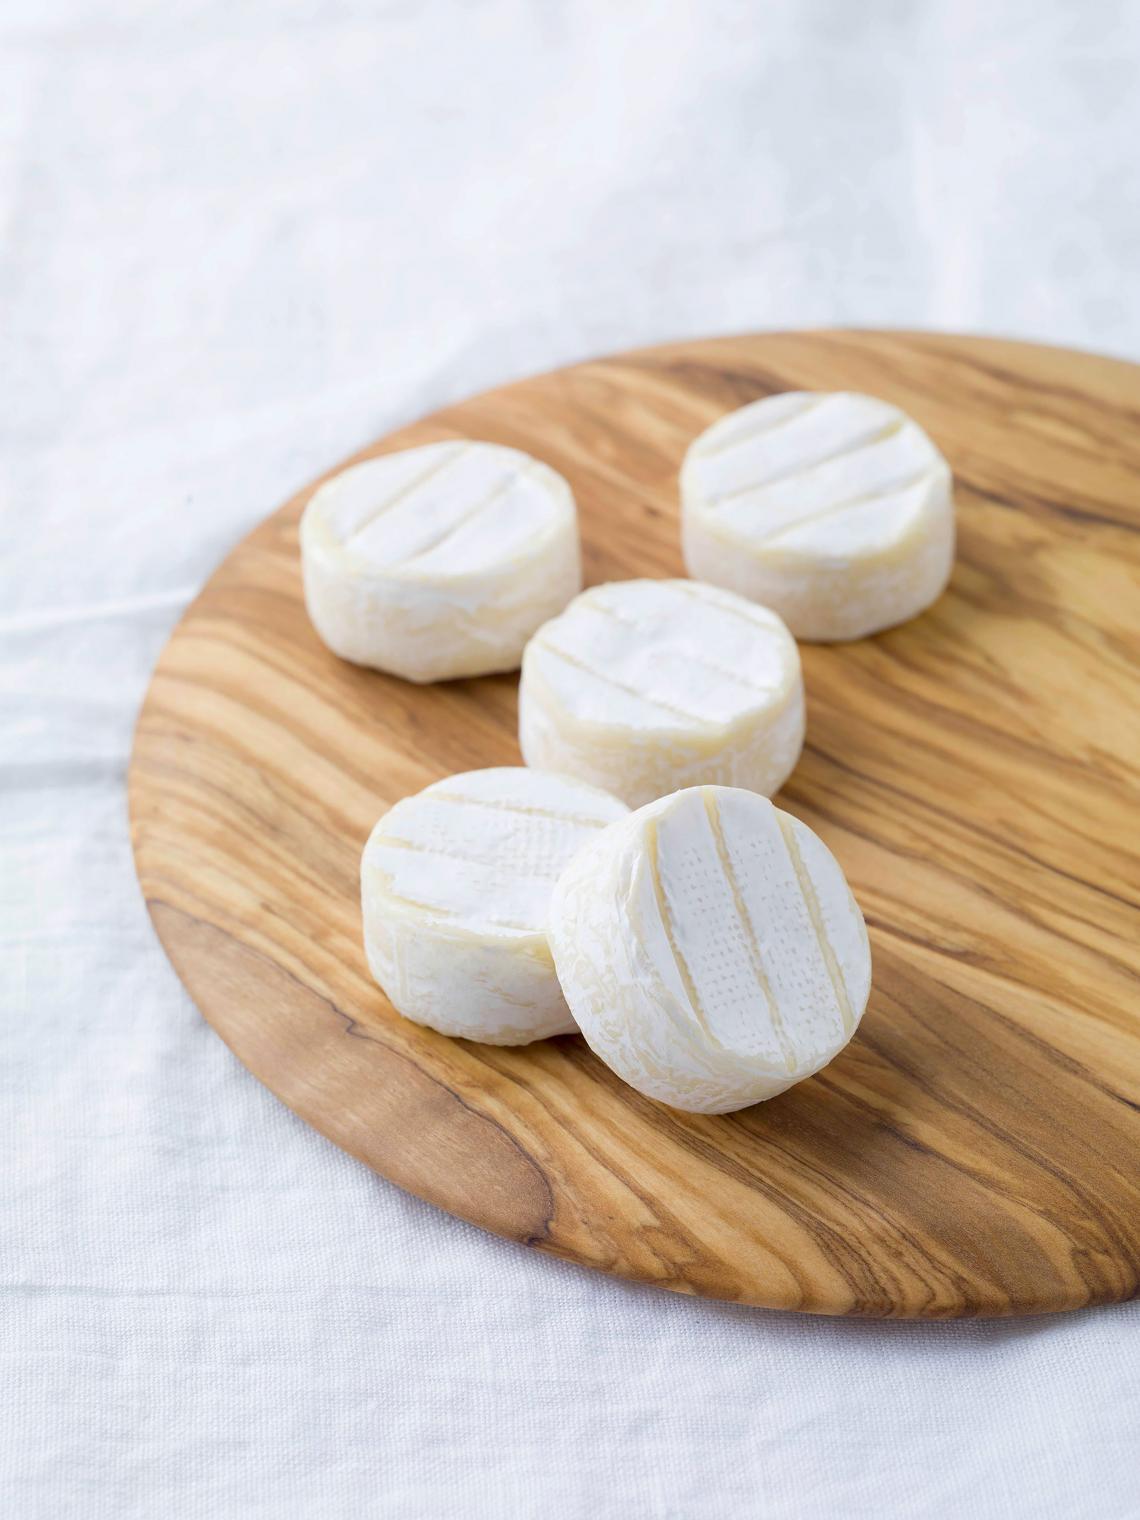 ILE DE FRANCE® Mini Brie on a plate